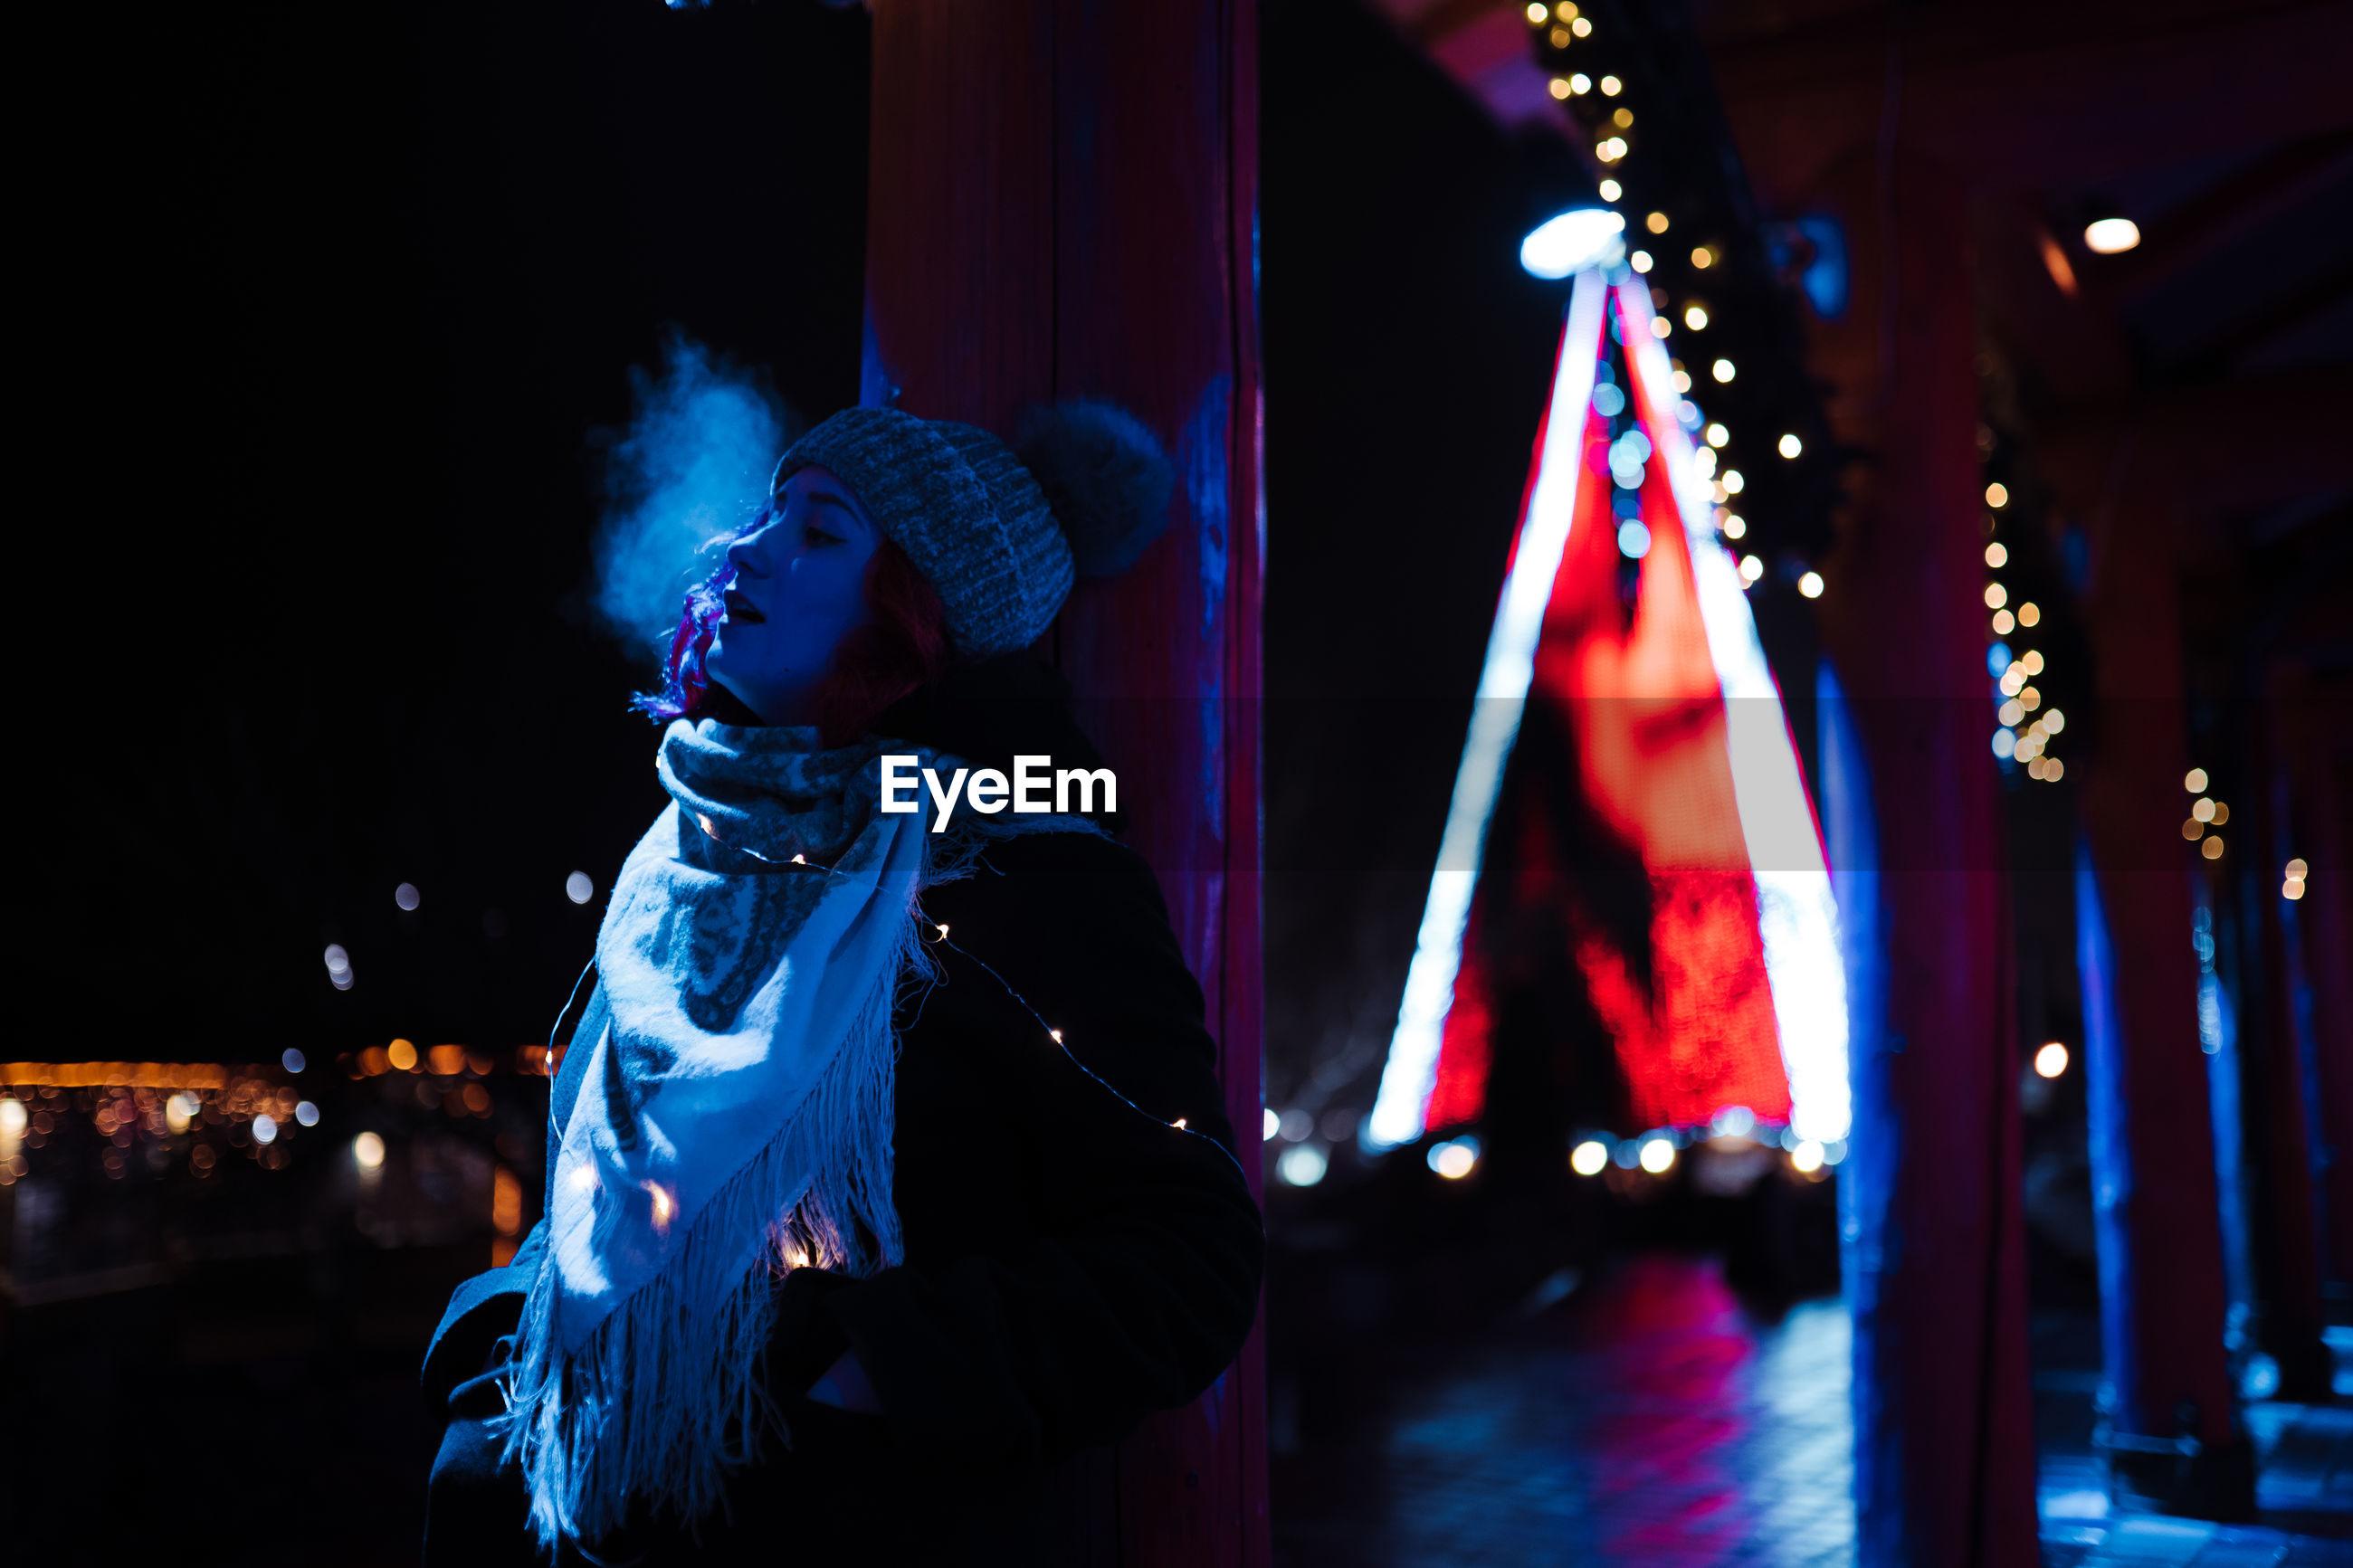 Woman looking at illuminated stage at night